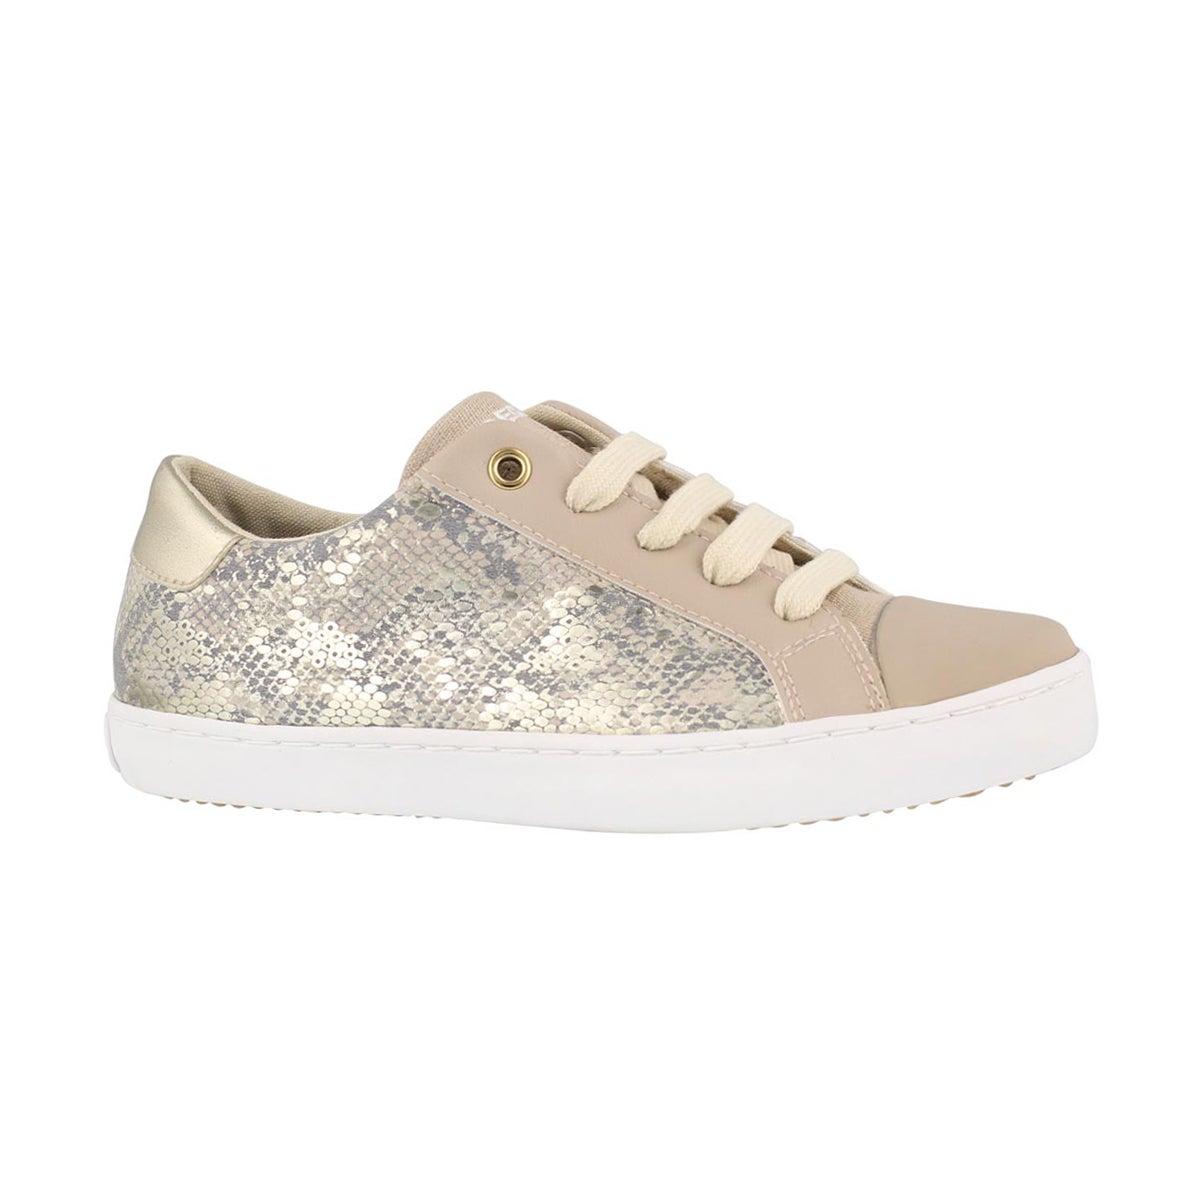 Girls' J GISLI beige sneakers